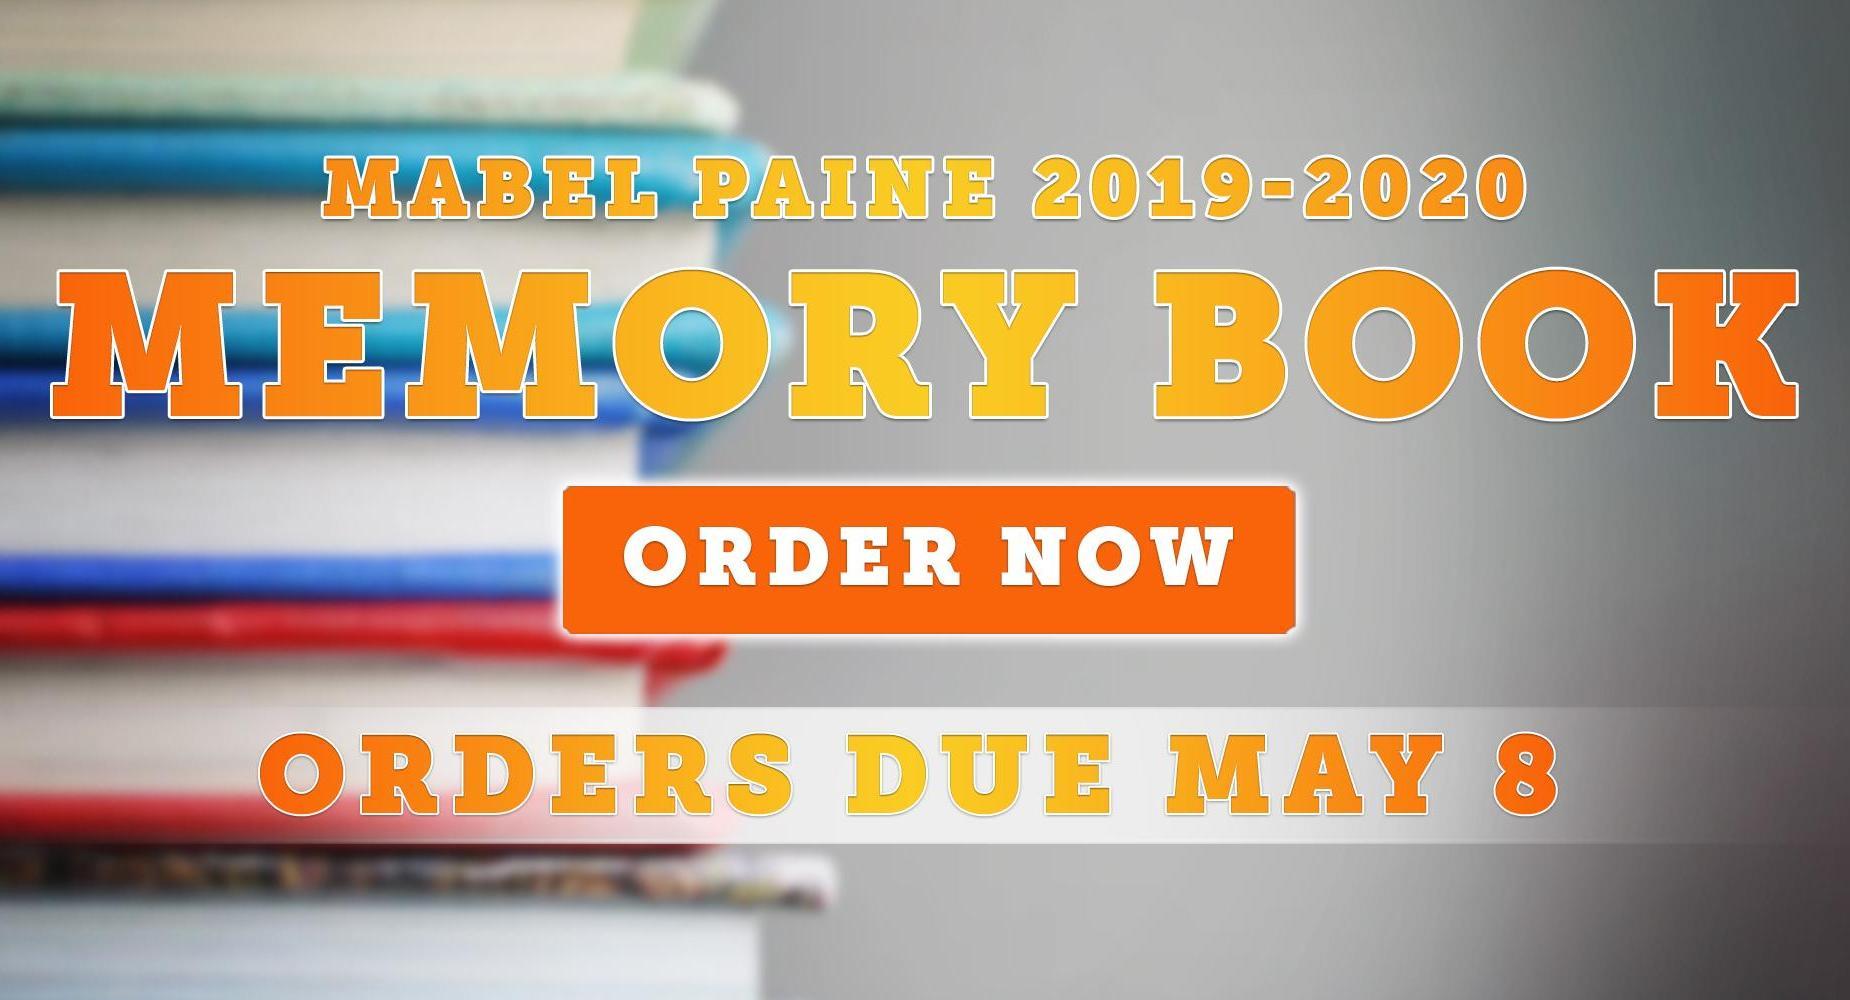 Mabel Paine Memory Book Orders